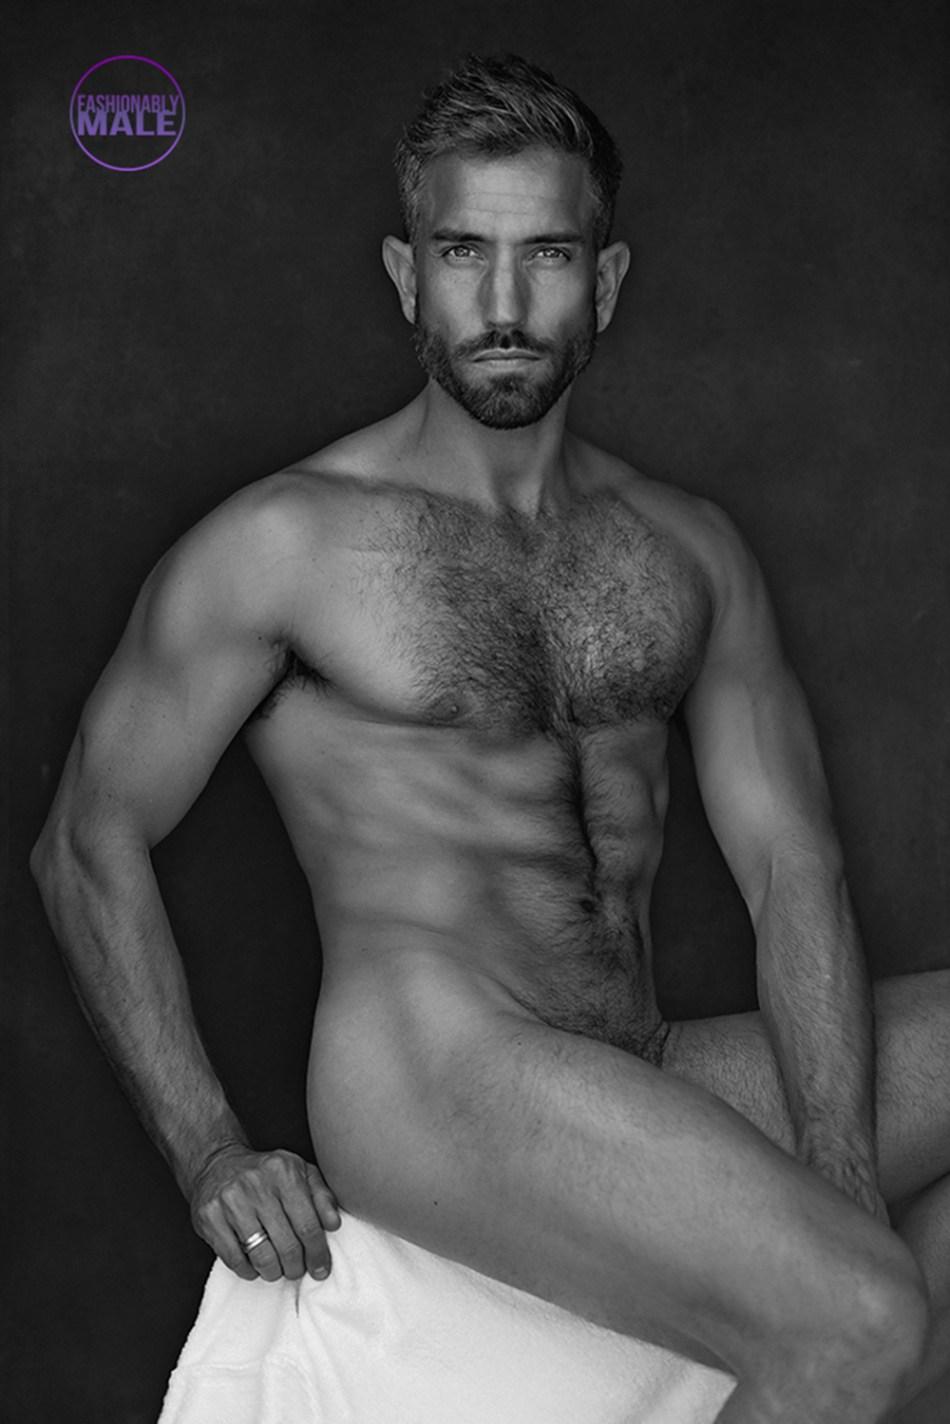 Stephane Marti by Shotsbygun for Fashionably Male11